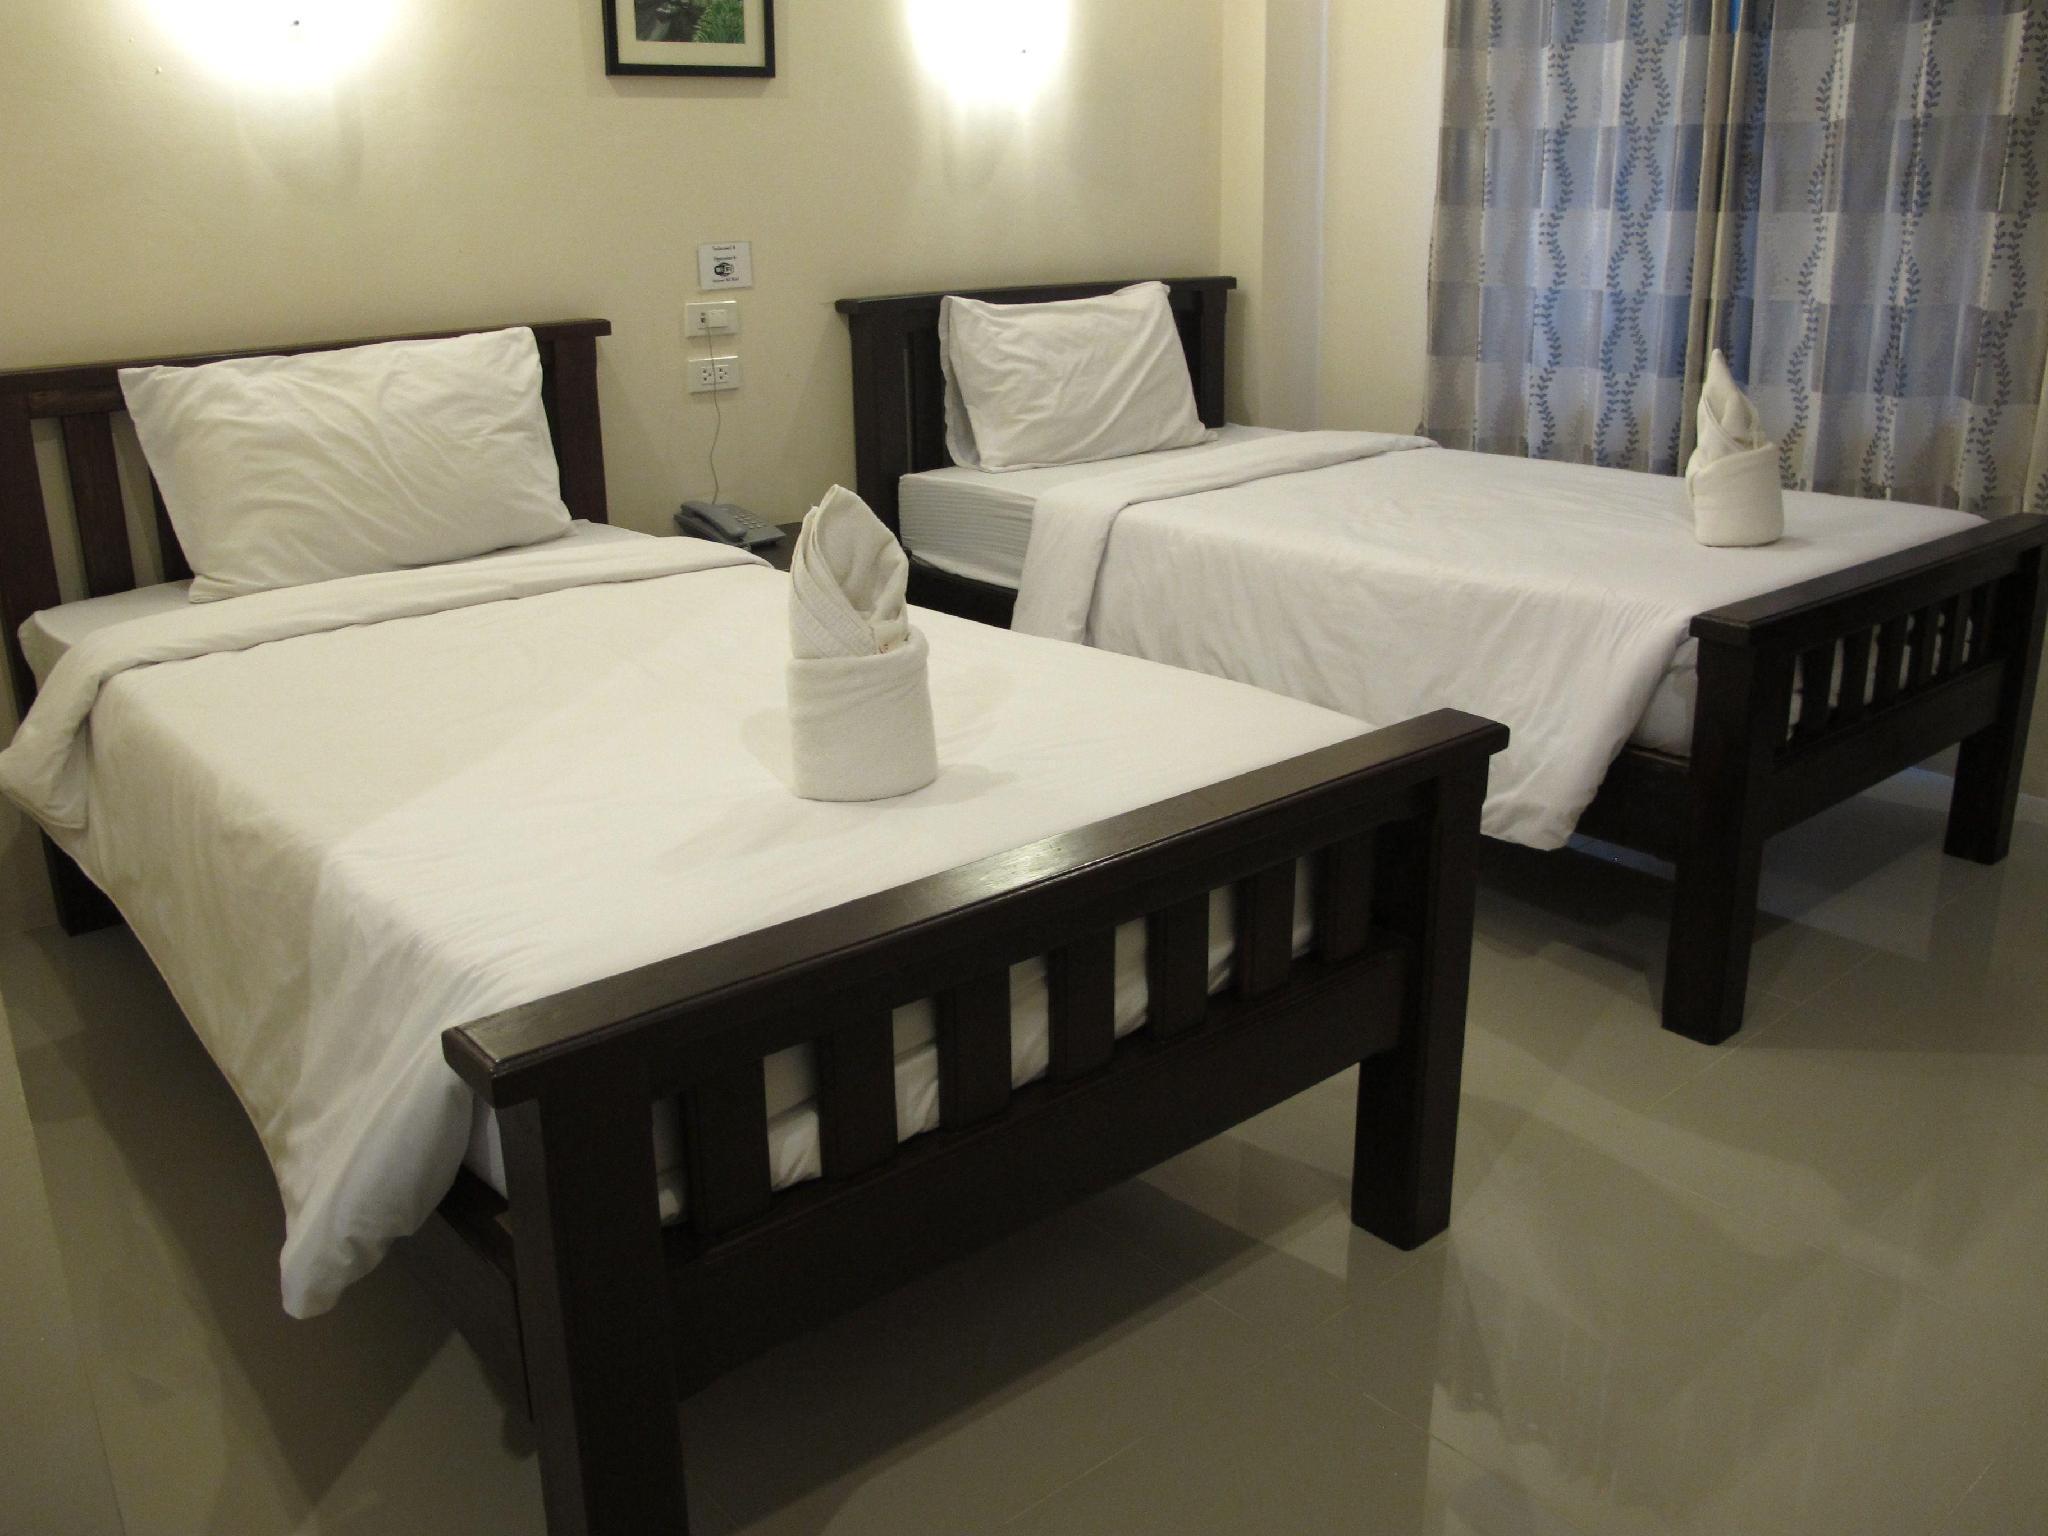 Koh Loi Hotel โรงแรมเกาะลอย